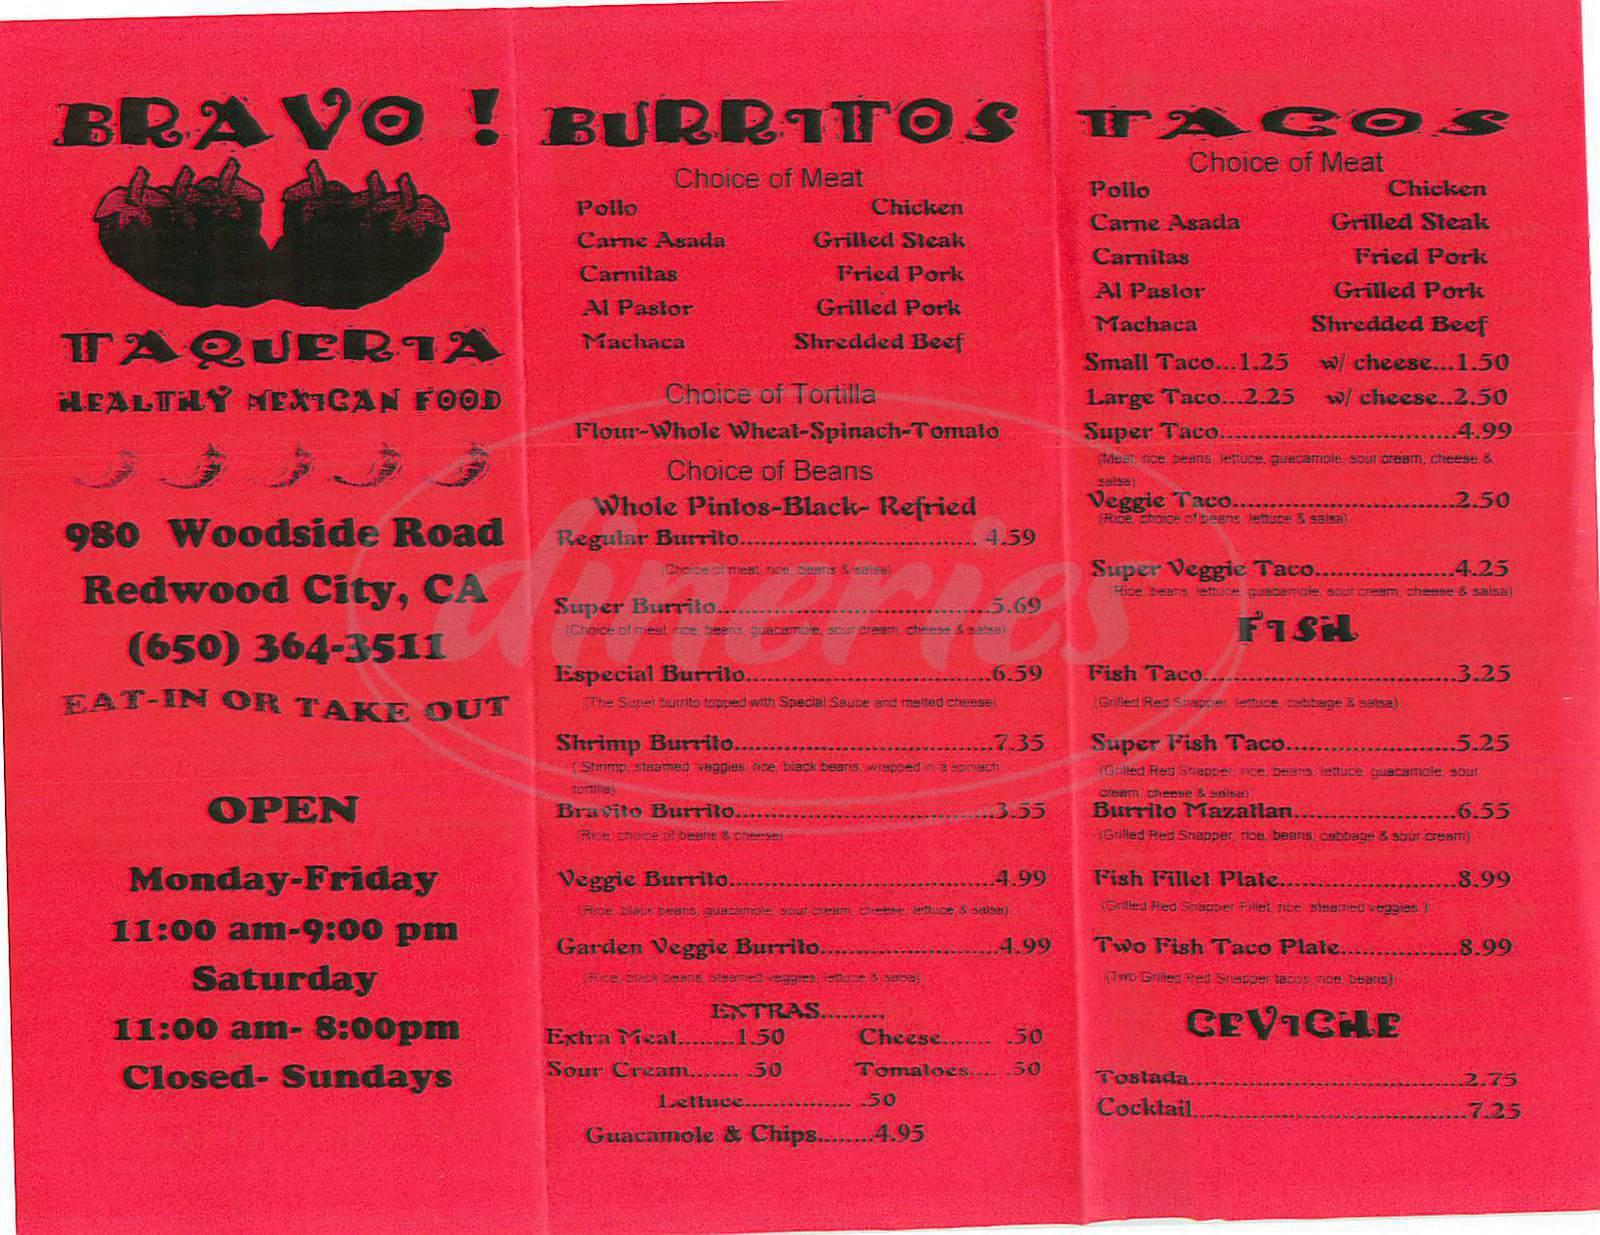 menu for Bravo Taqueria